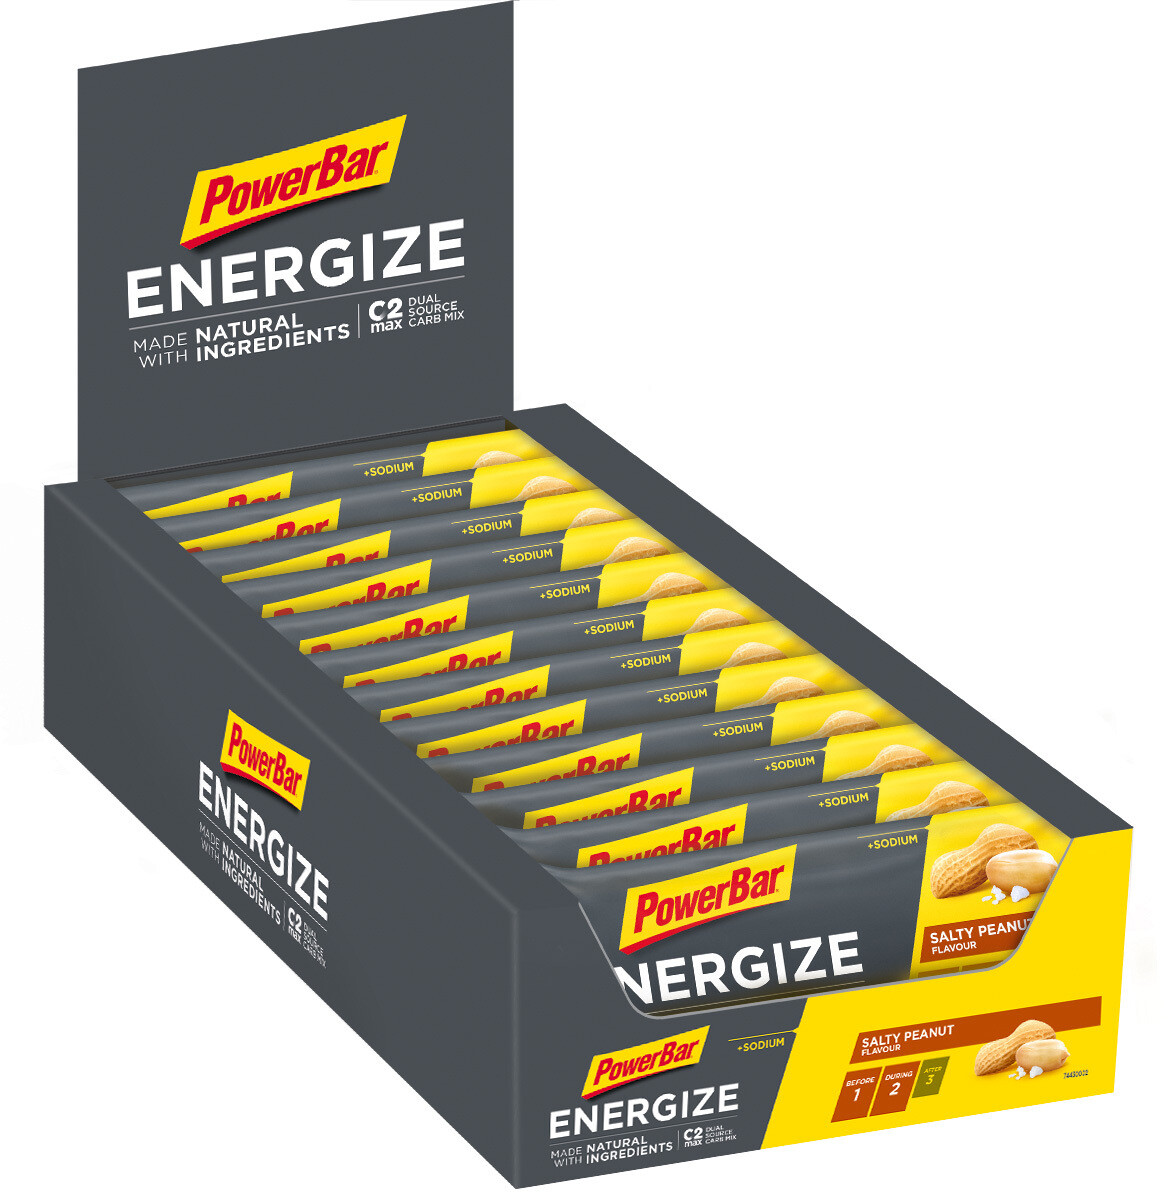 PowerBar Energize Made with Natural Ingredients Bar Box 25x55g, Salty Peanut (2019)   Energy bar